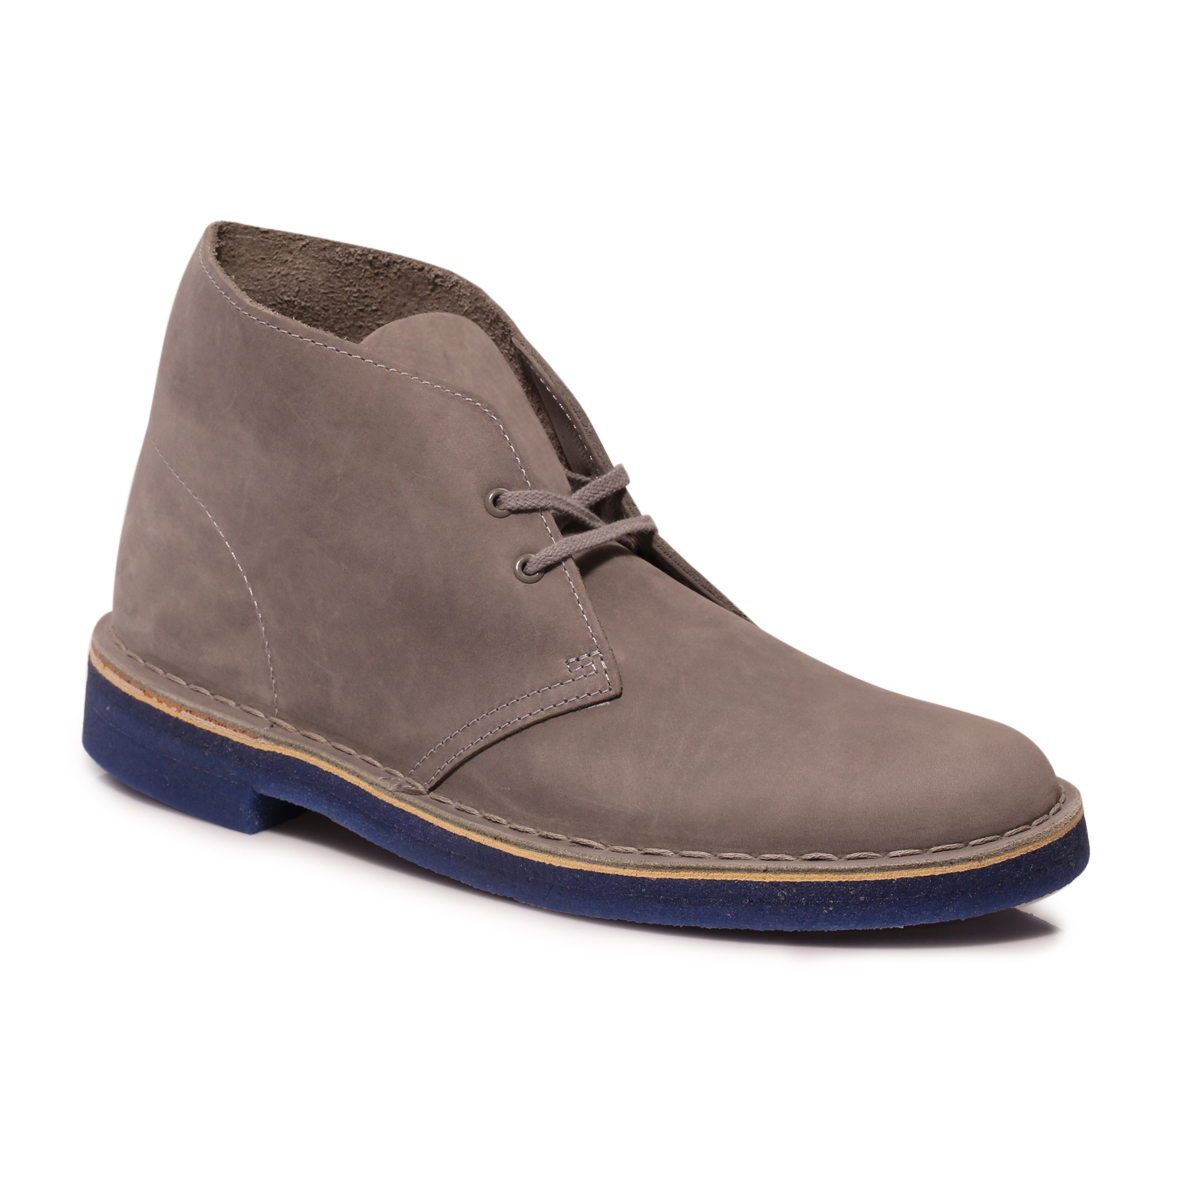 Clarks Mens Grey Blue Suede Desert Boots Shoes Size 7-11 | eBay